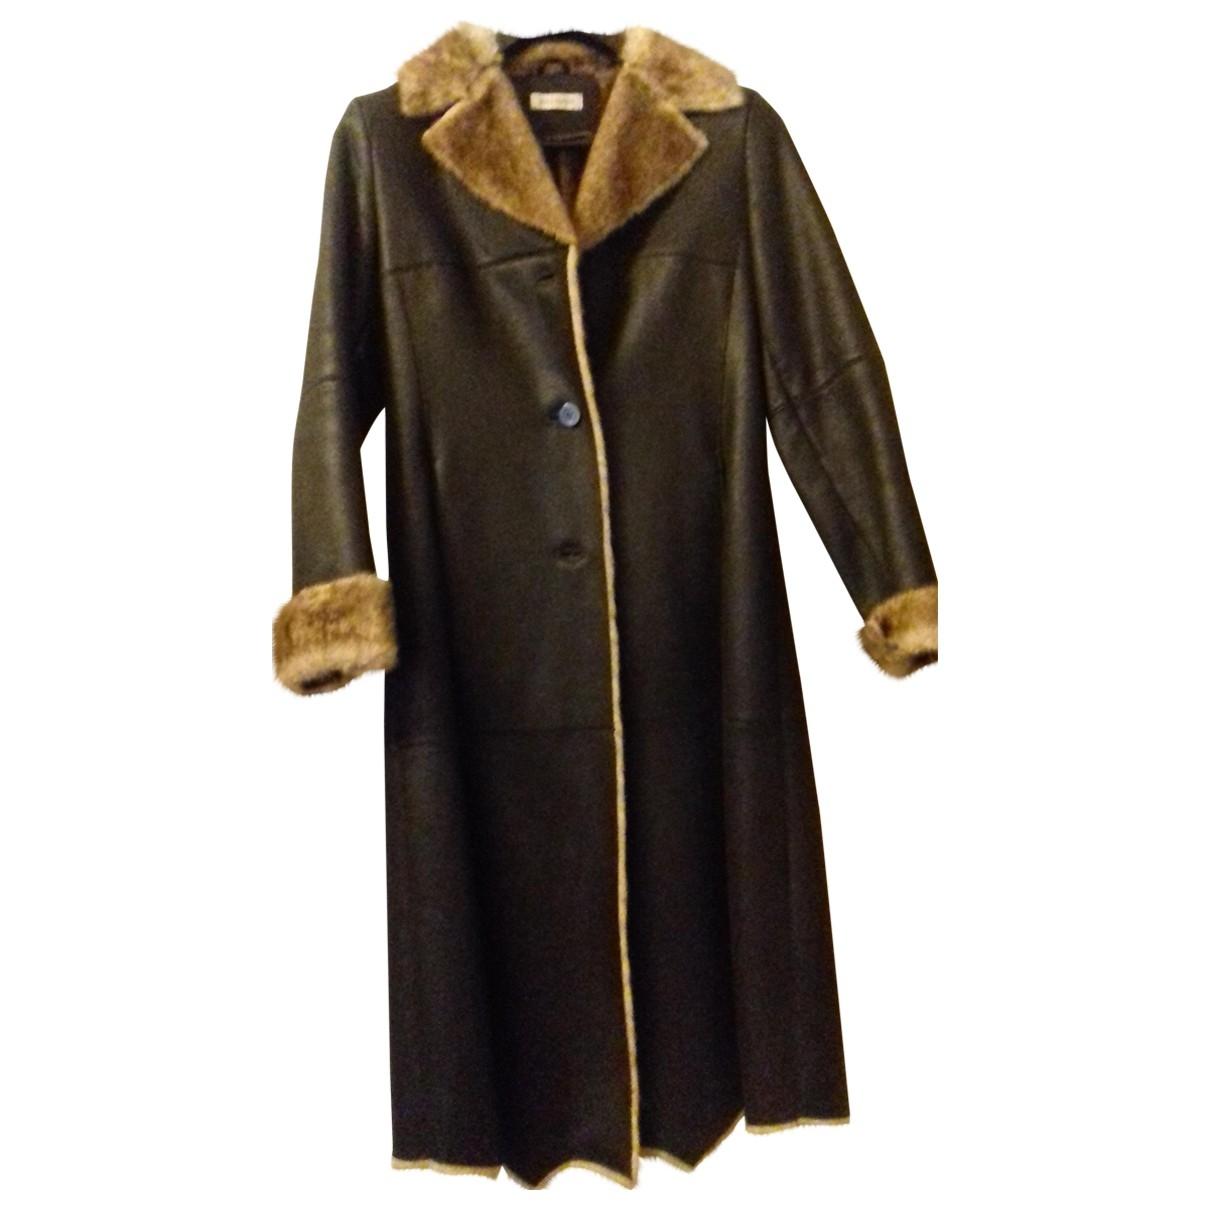 Pierre Balmain \N Brown coat for Women L International